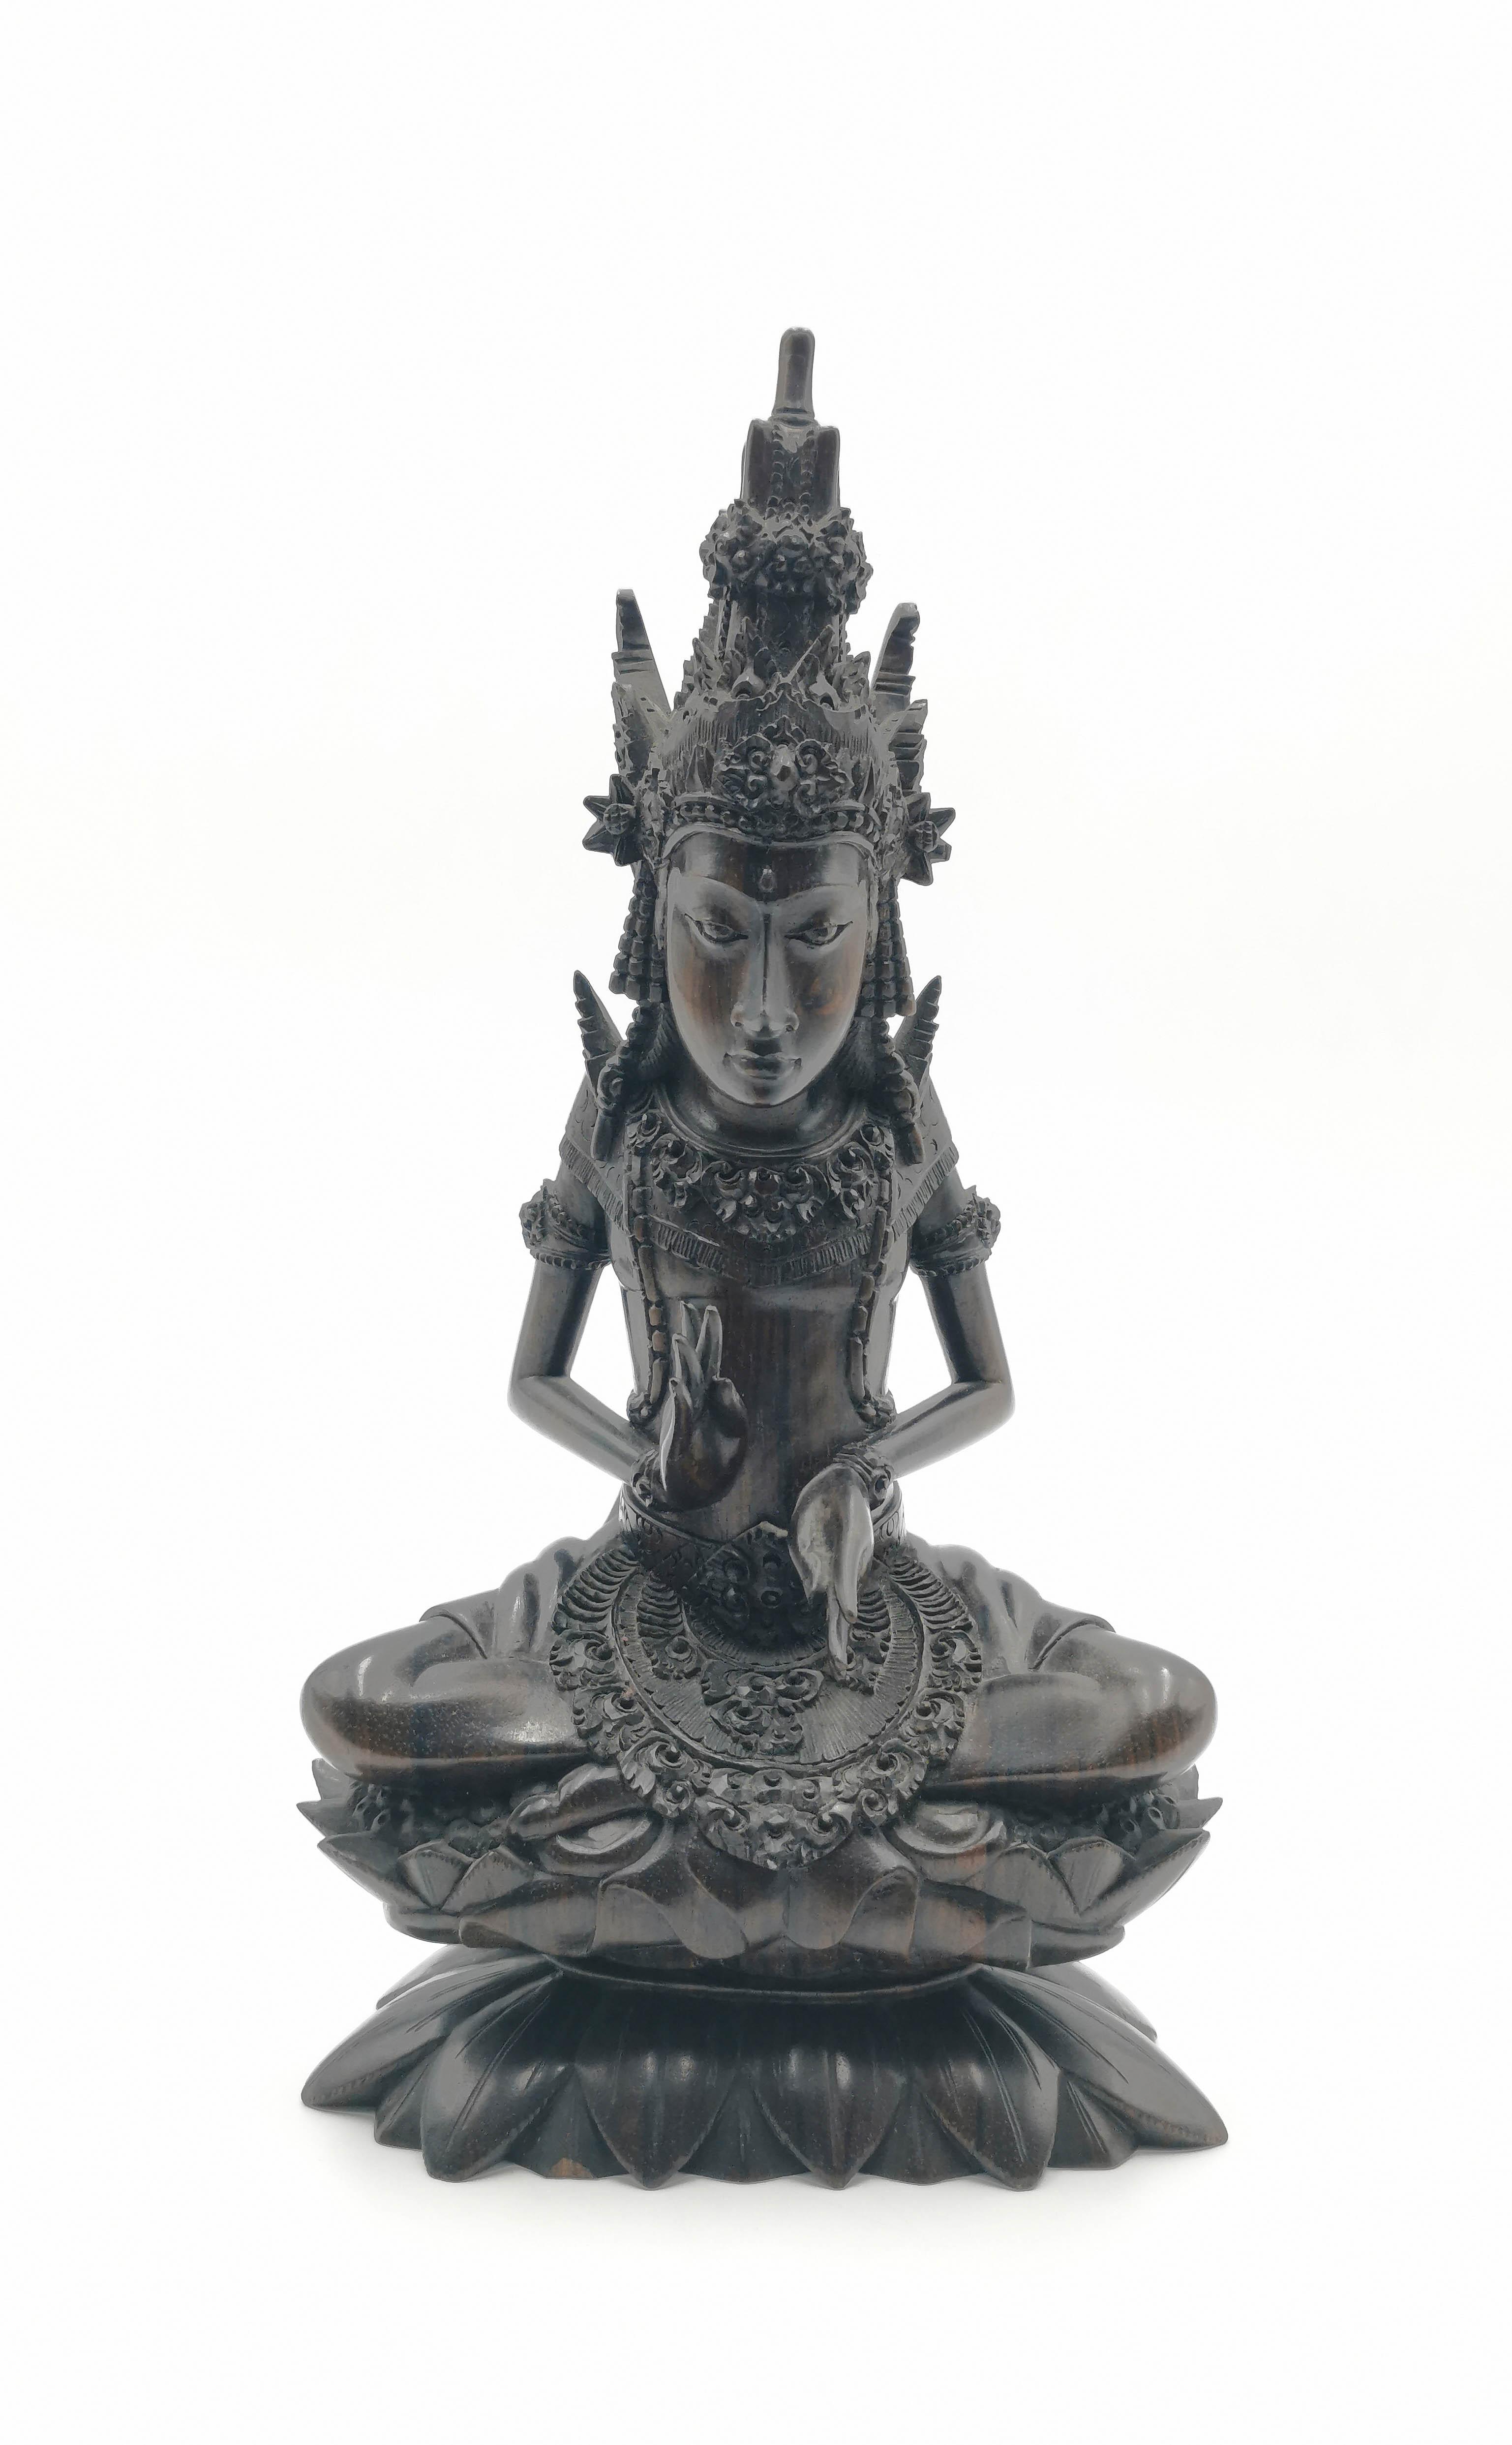 Posąg boga hinduskiego